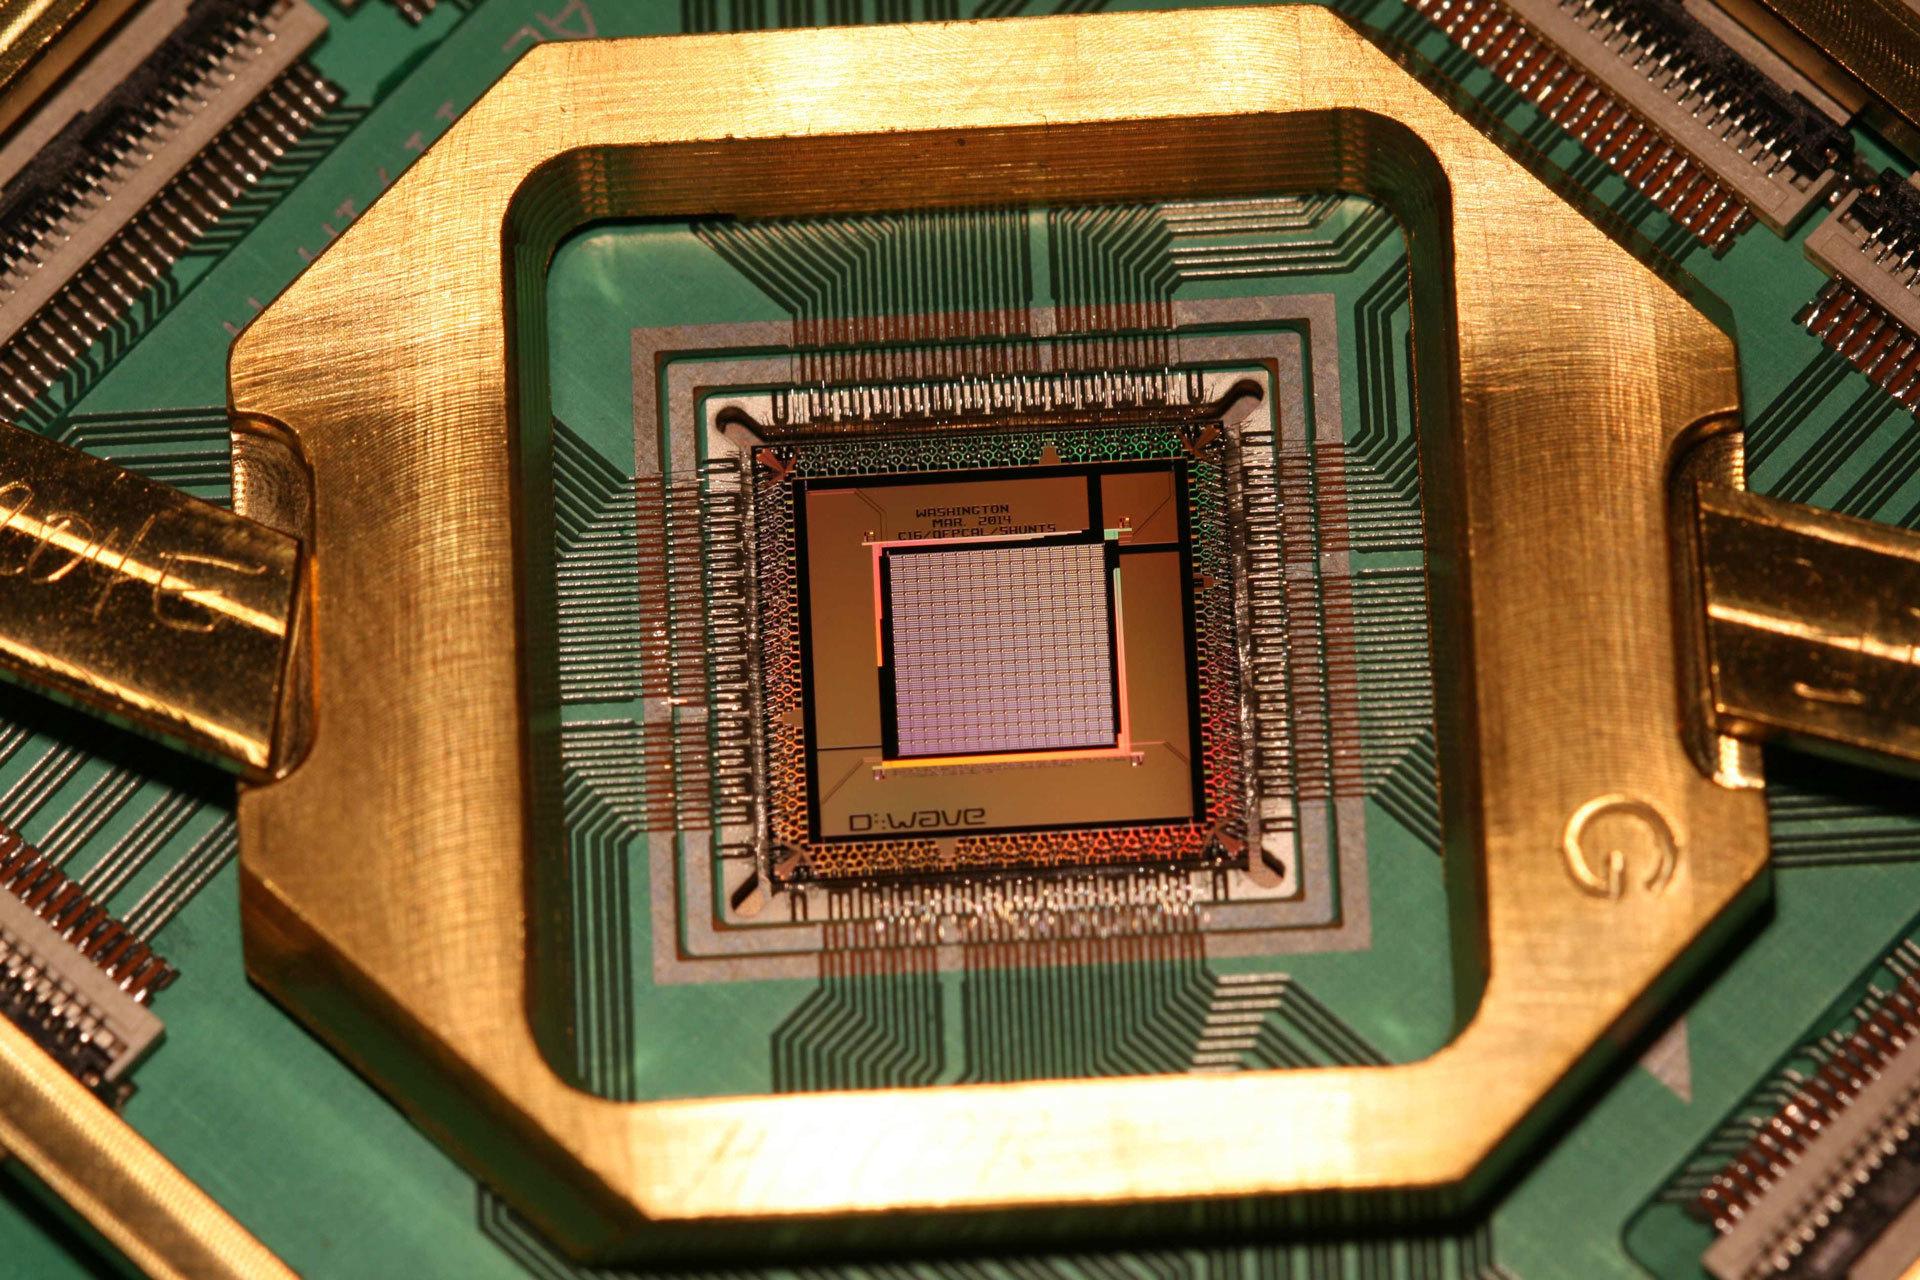 квантовый компьютер Google, Wolksvagen